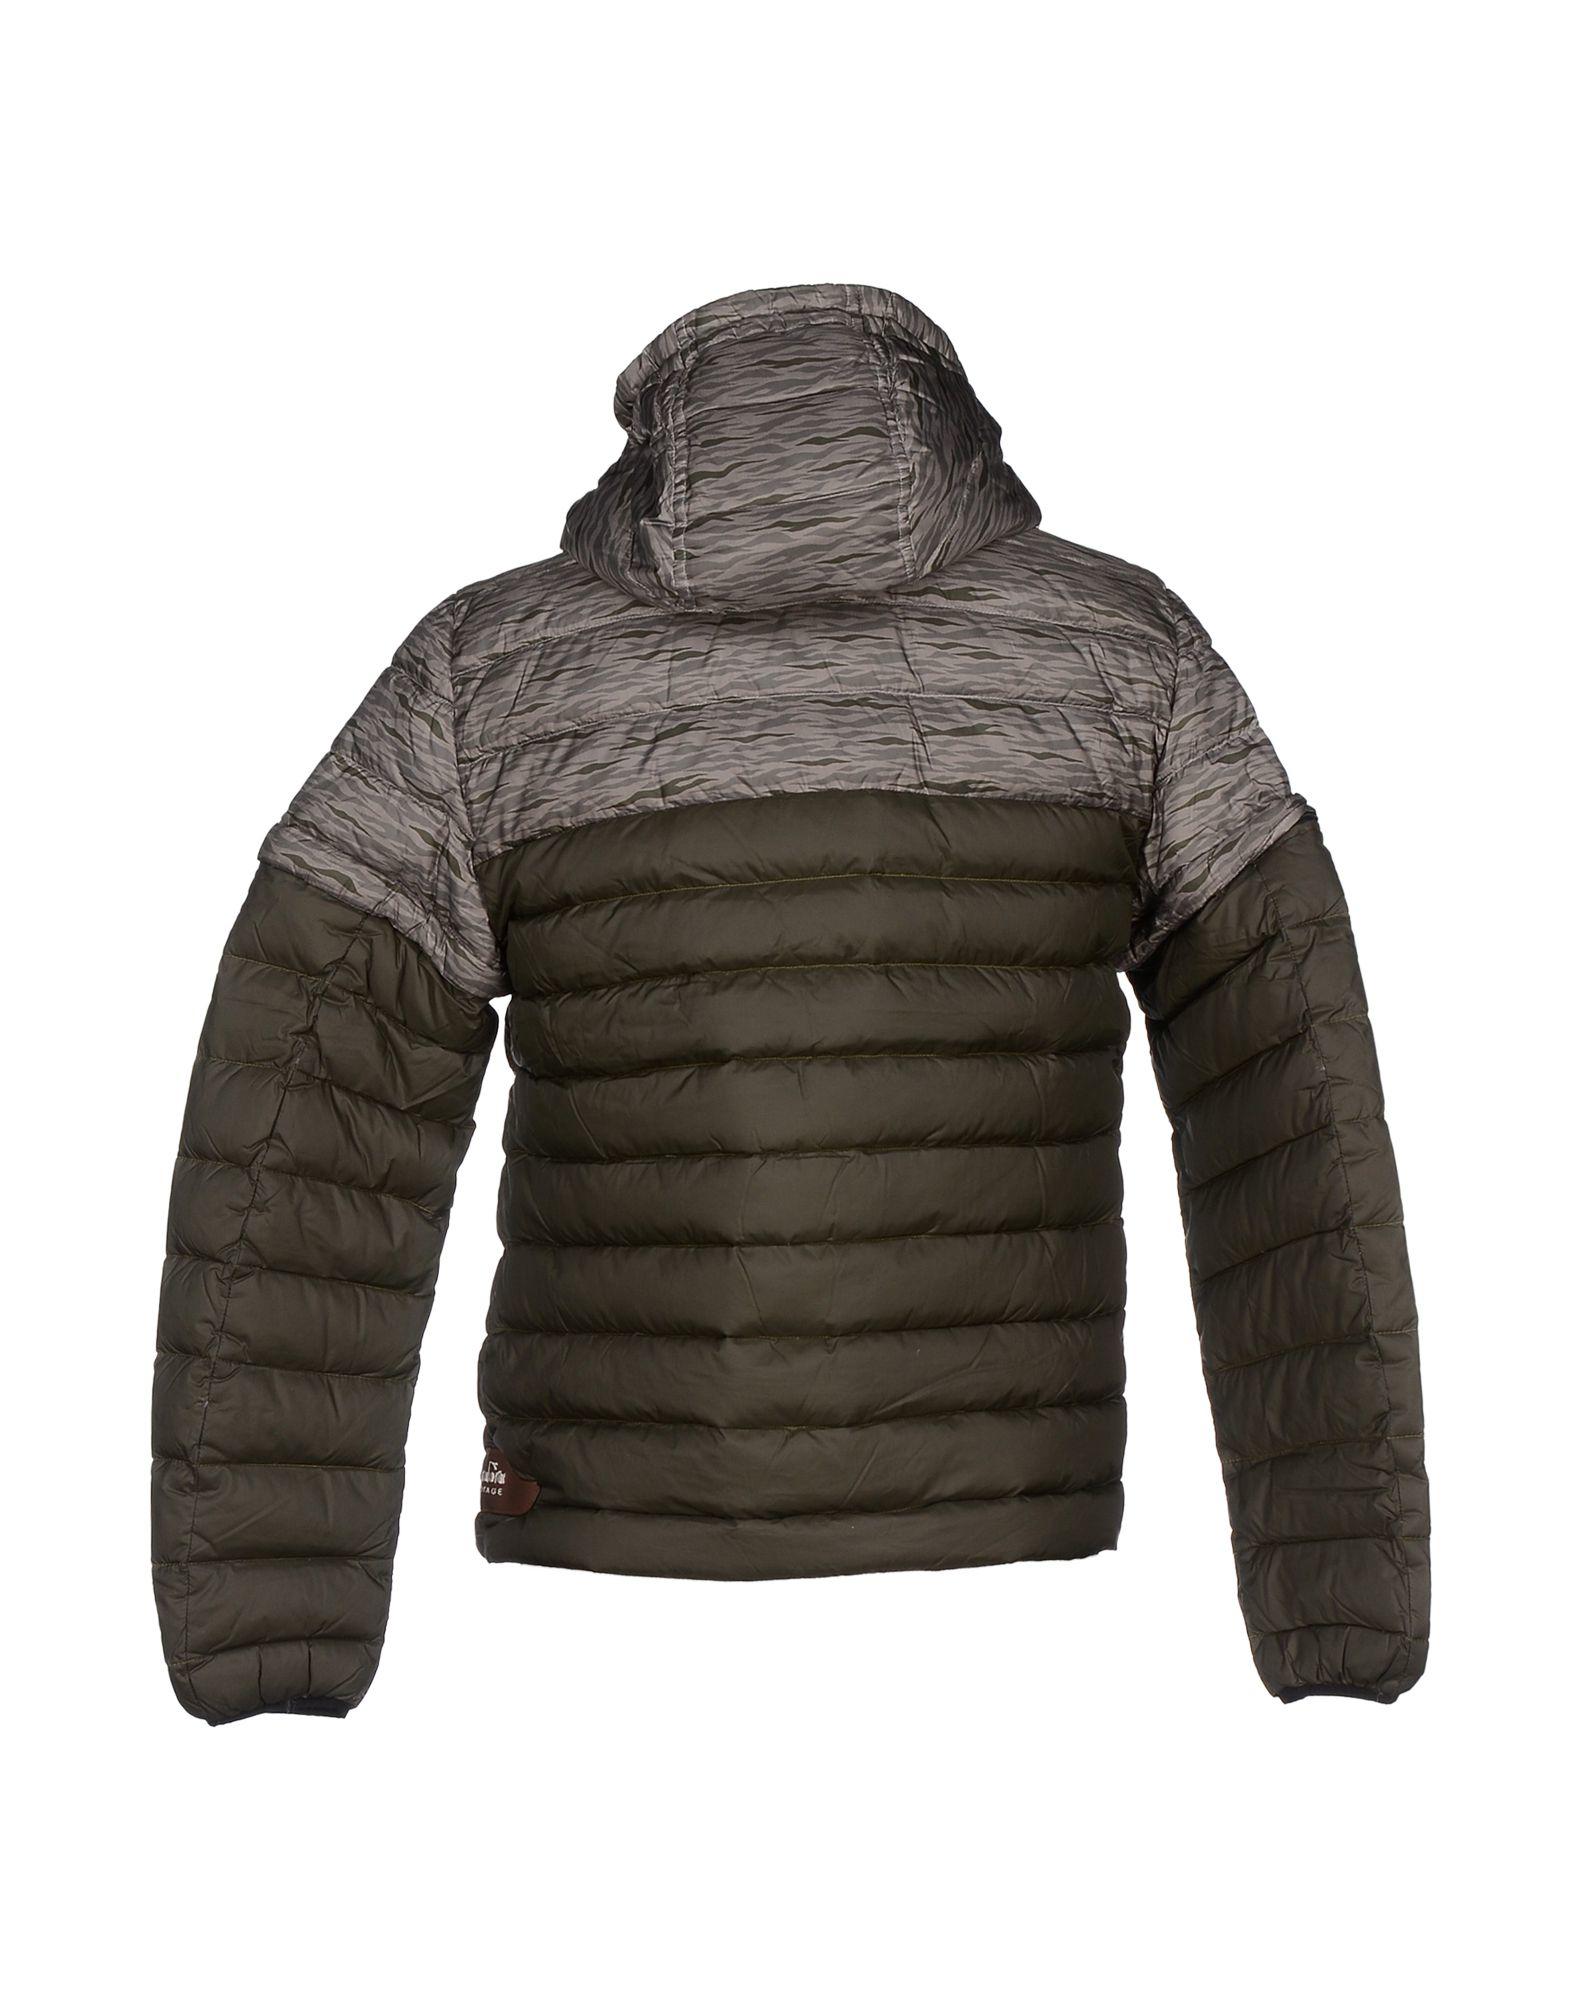 Diadora Goose Down Jacket in Dark Green (Grey) for Men